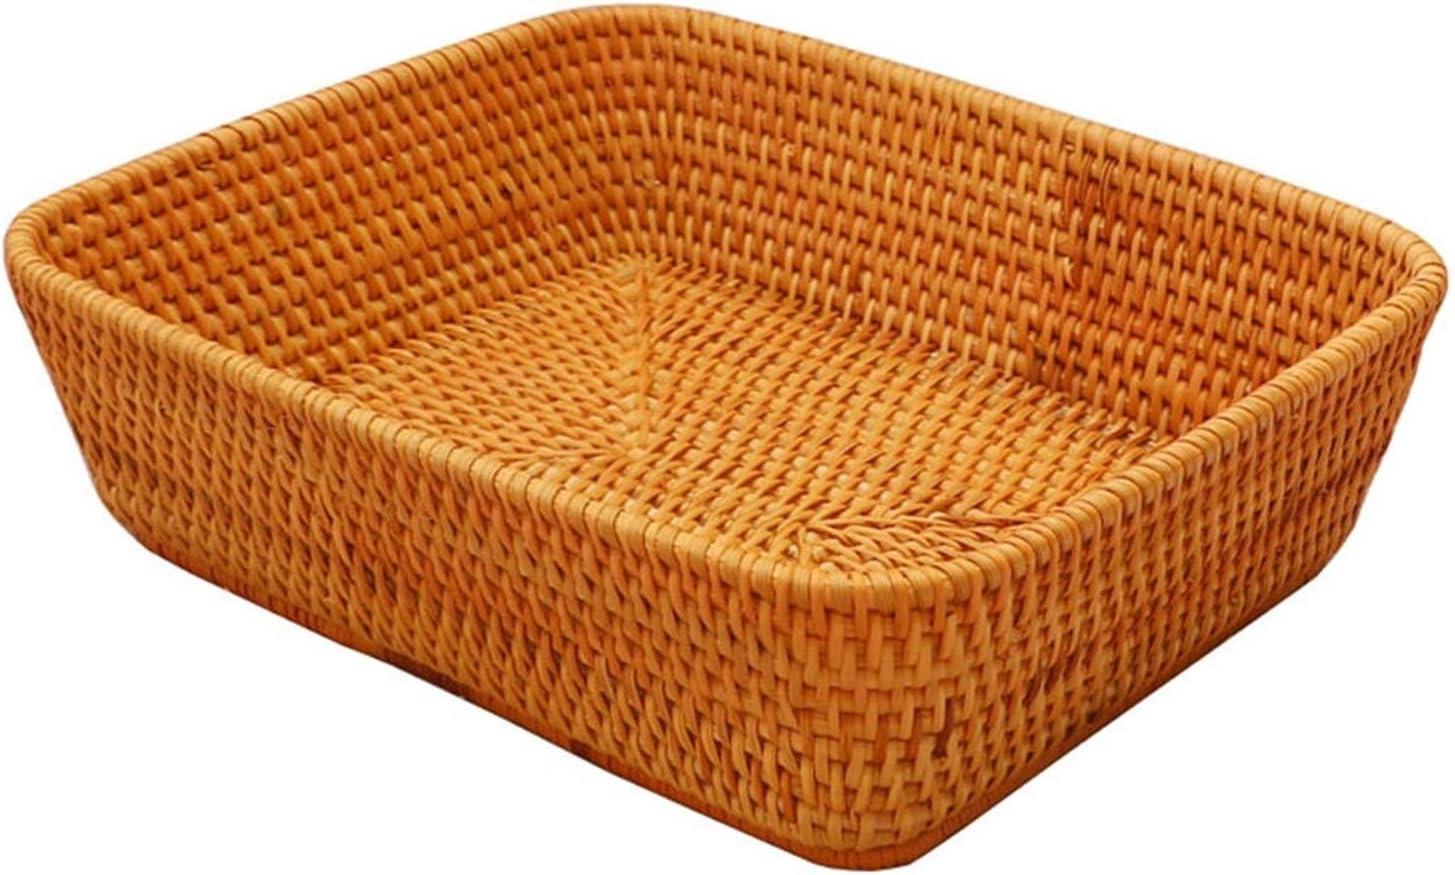 Hand-made rectangular wicker fruit multi-purpose tray Popular standard bread box Phoenix Mall